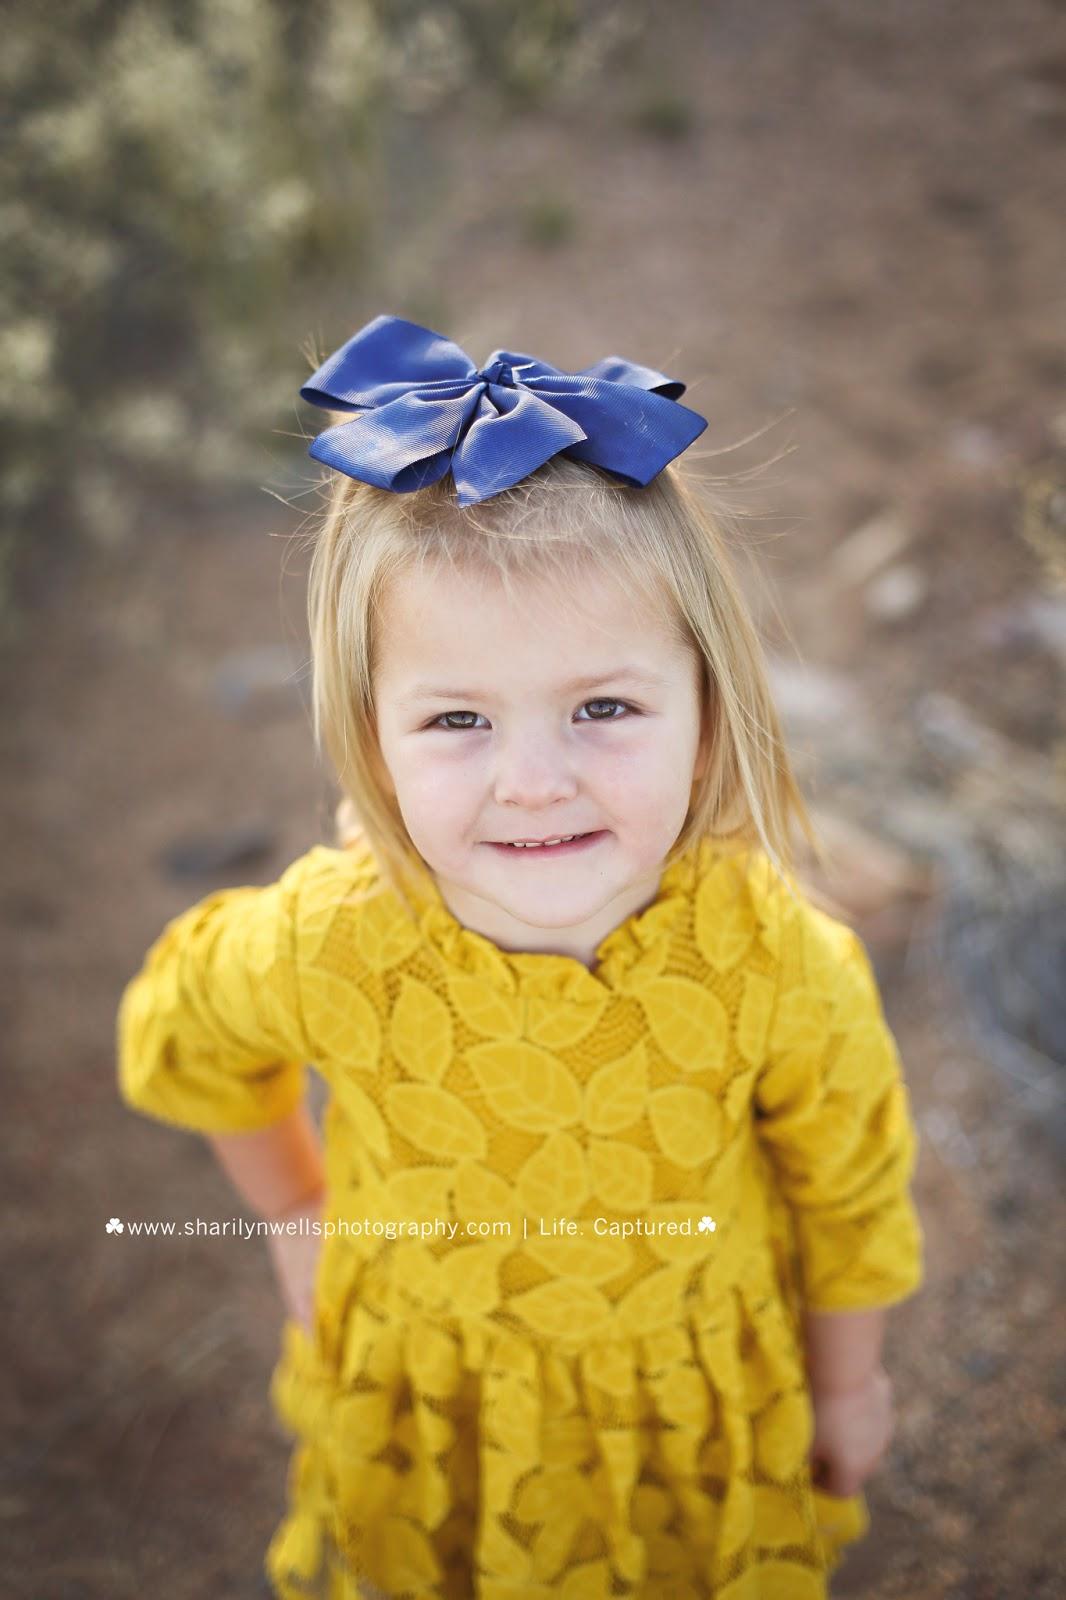 Sharilyn Wells Photography: Desert Family Fun   Holiday